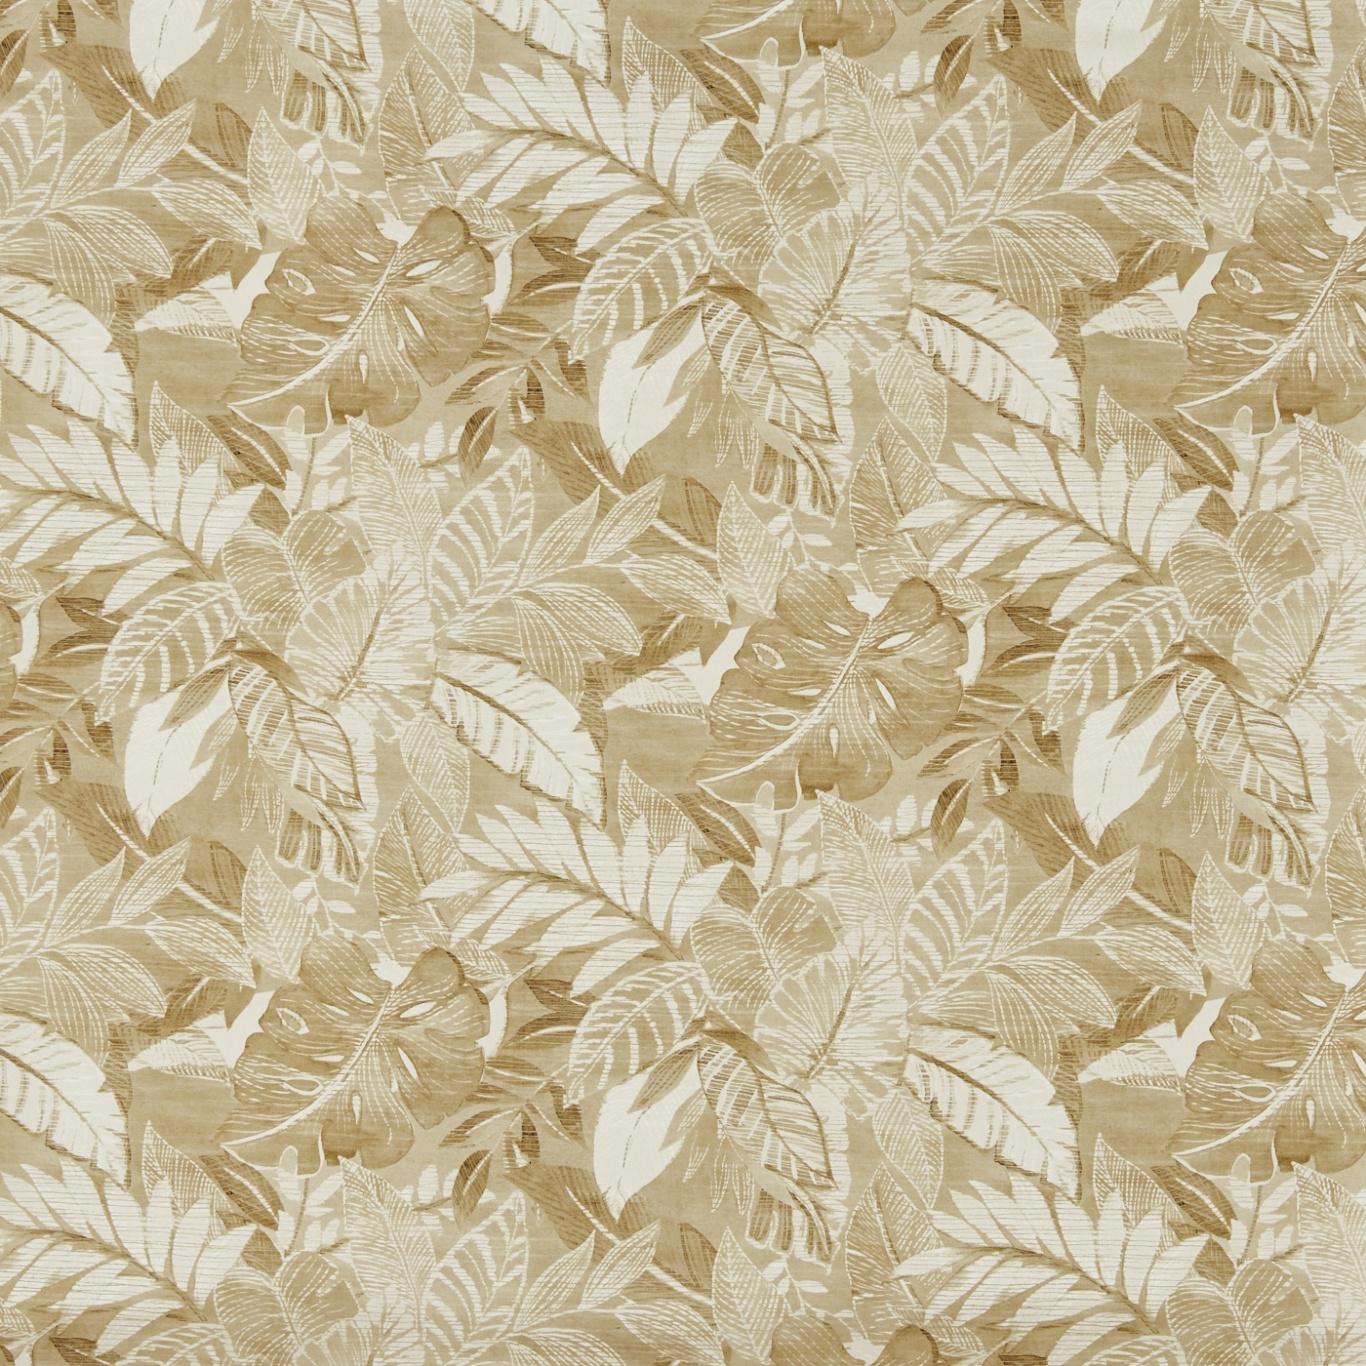 Image of Prestigious Mahalo Amber Fabric 8703/502